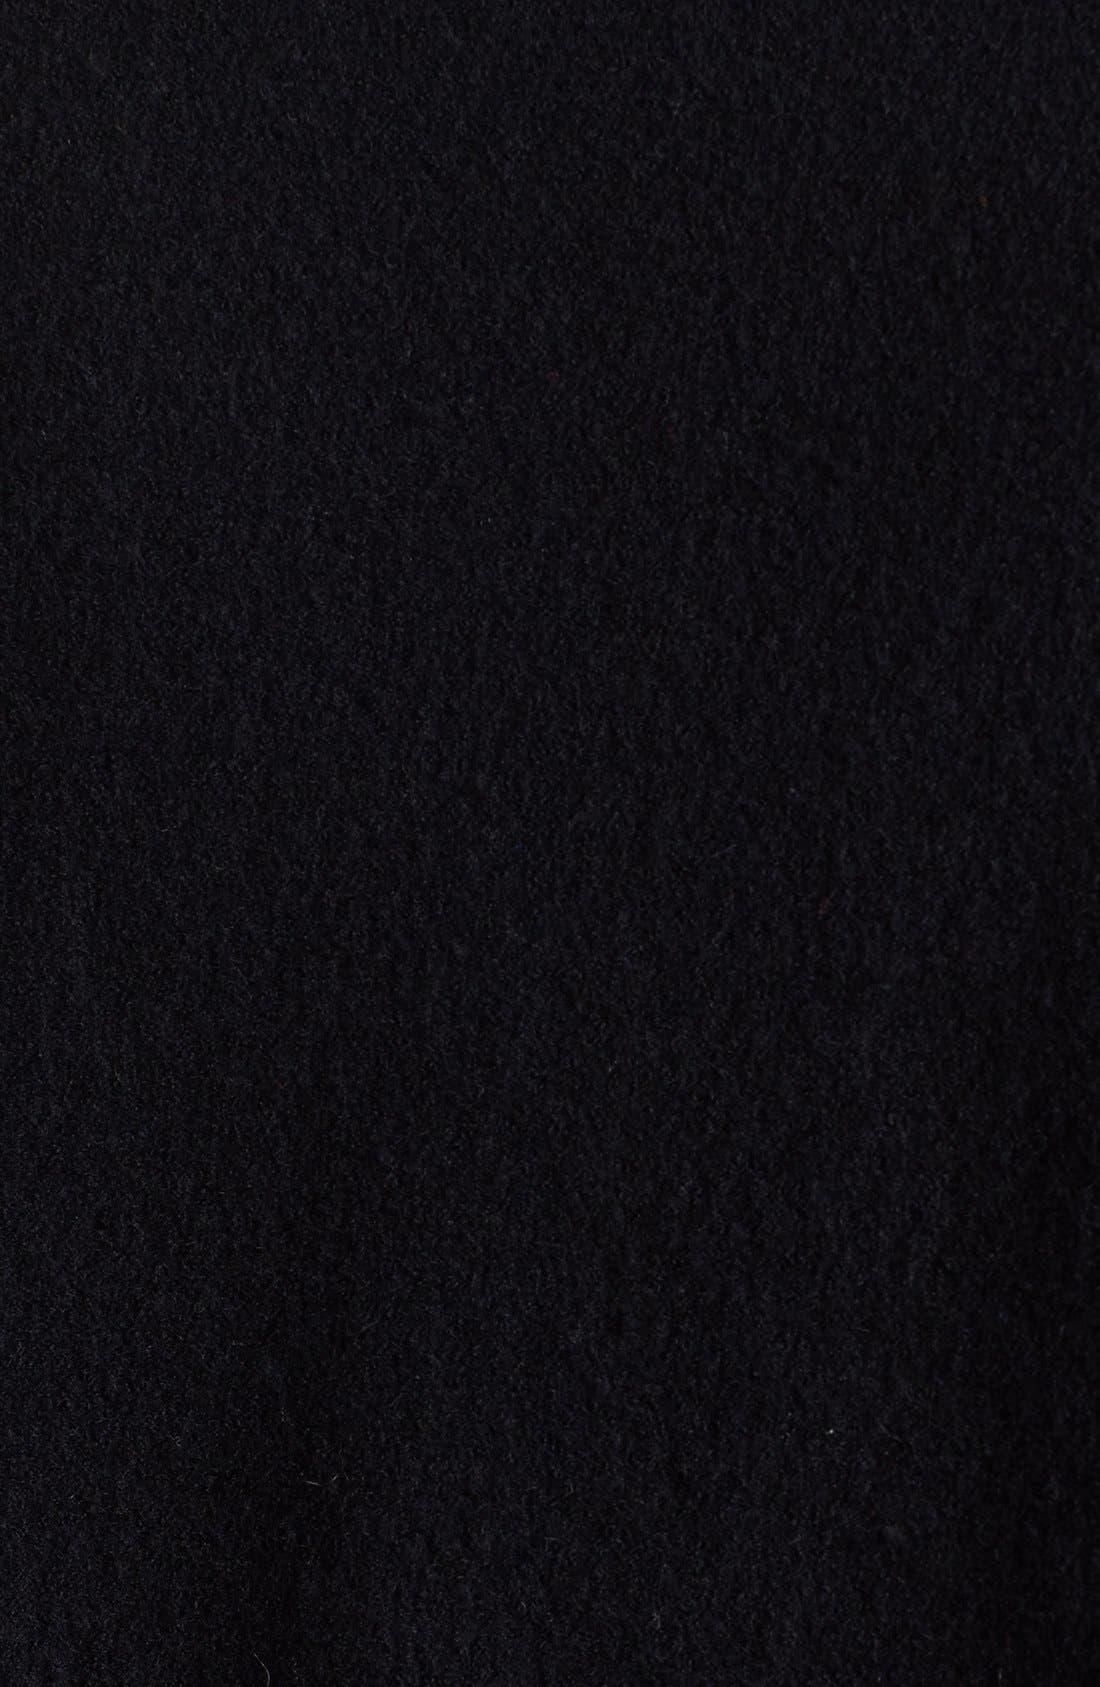 Alternate Image 3  - Halogen® Wool & Faux Leather Jacket (Plus Size)